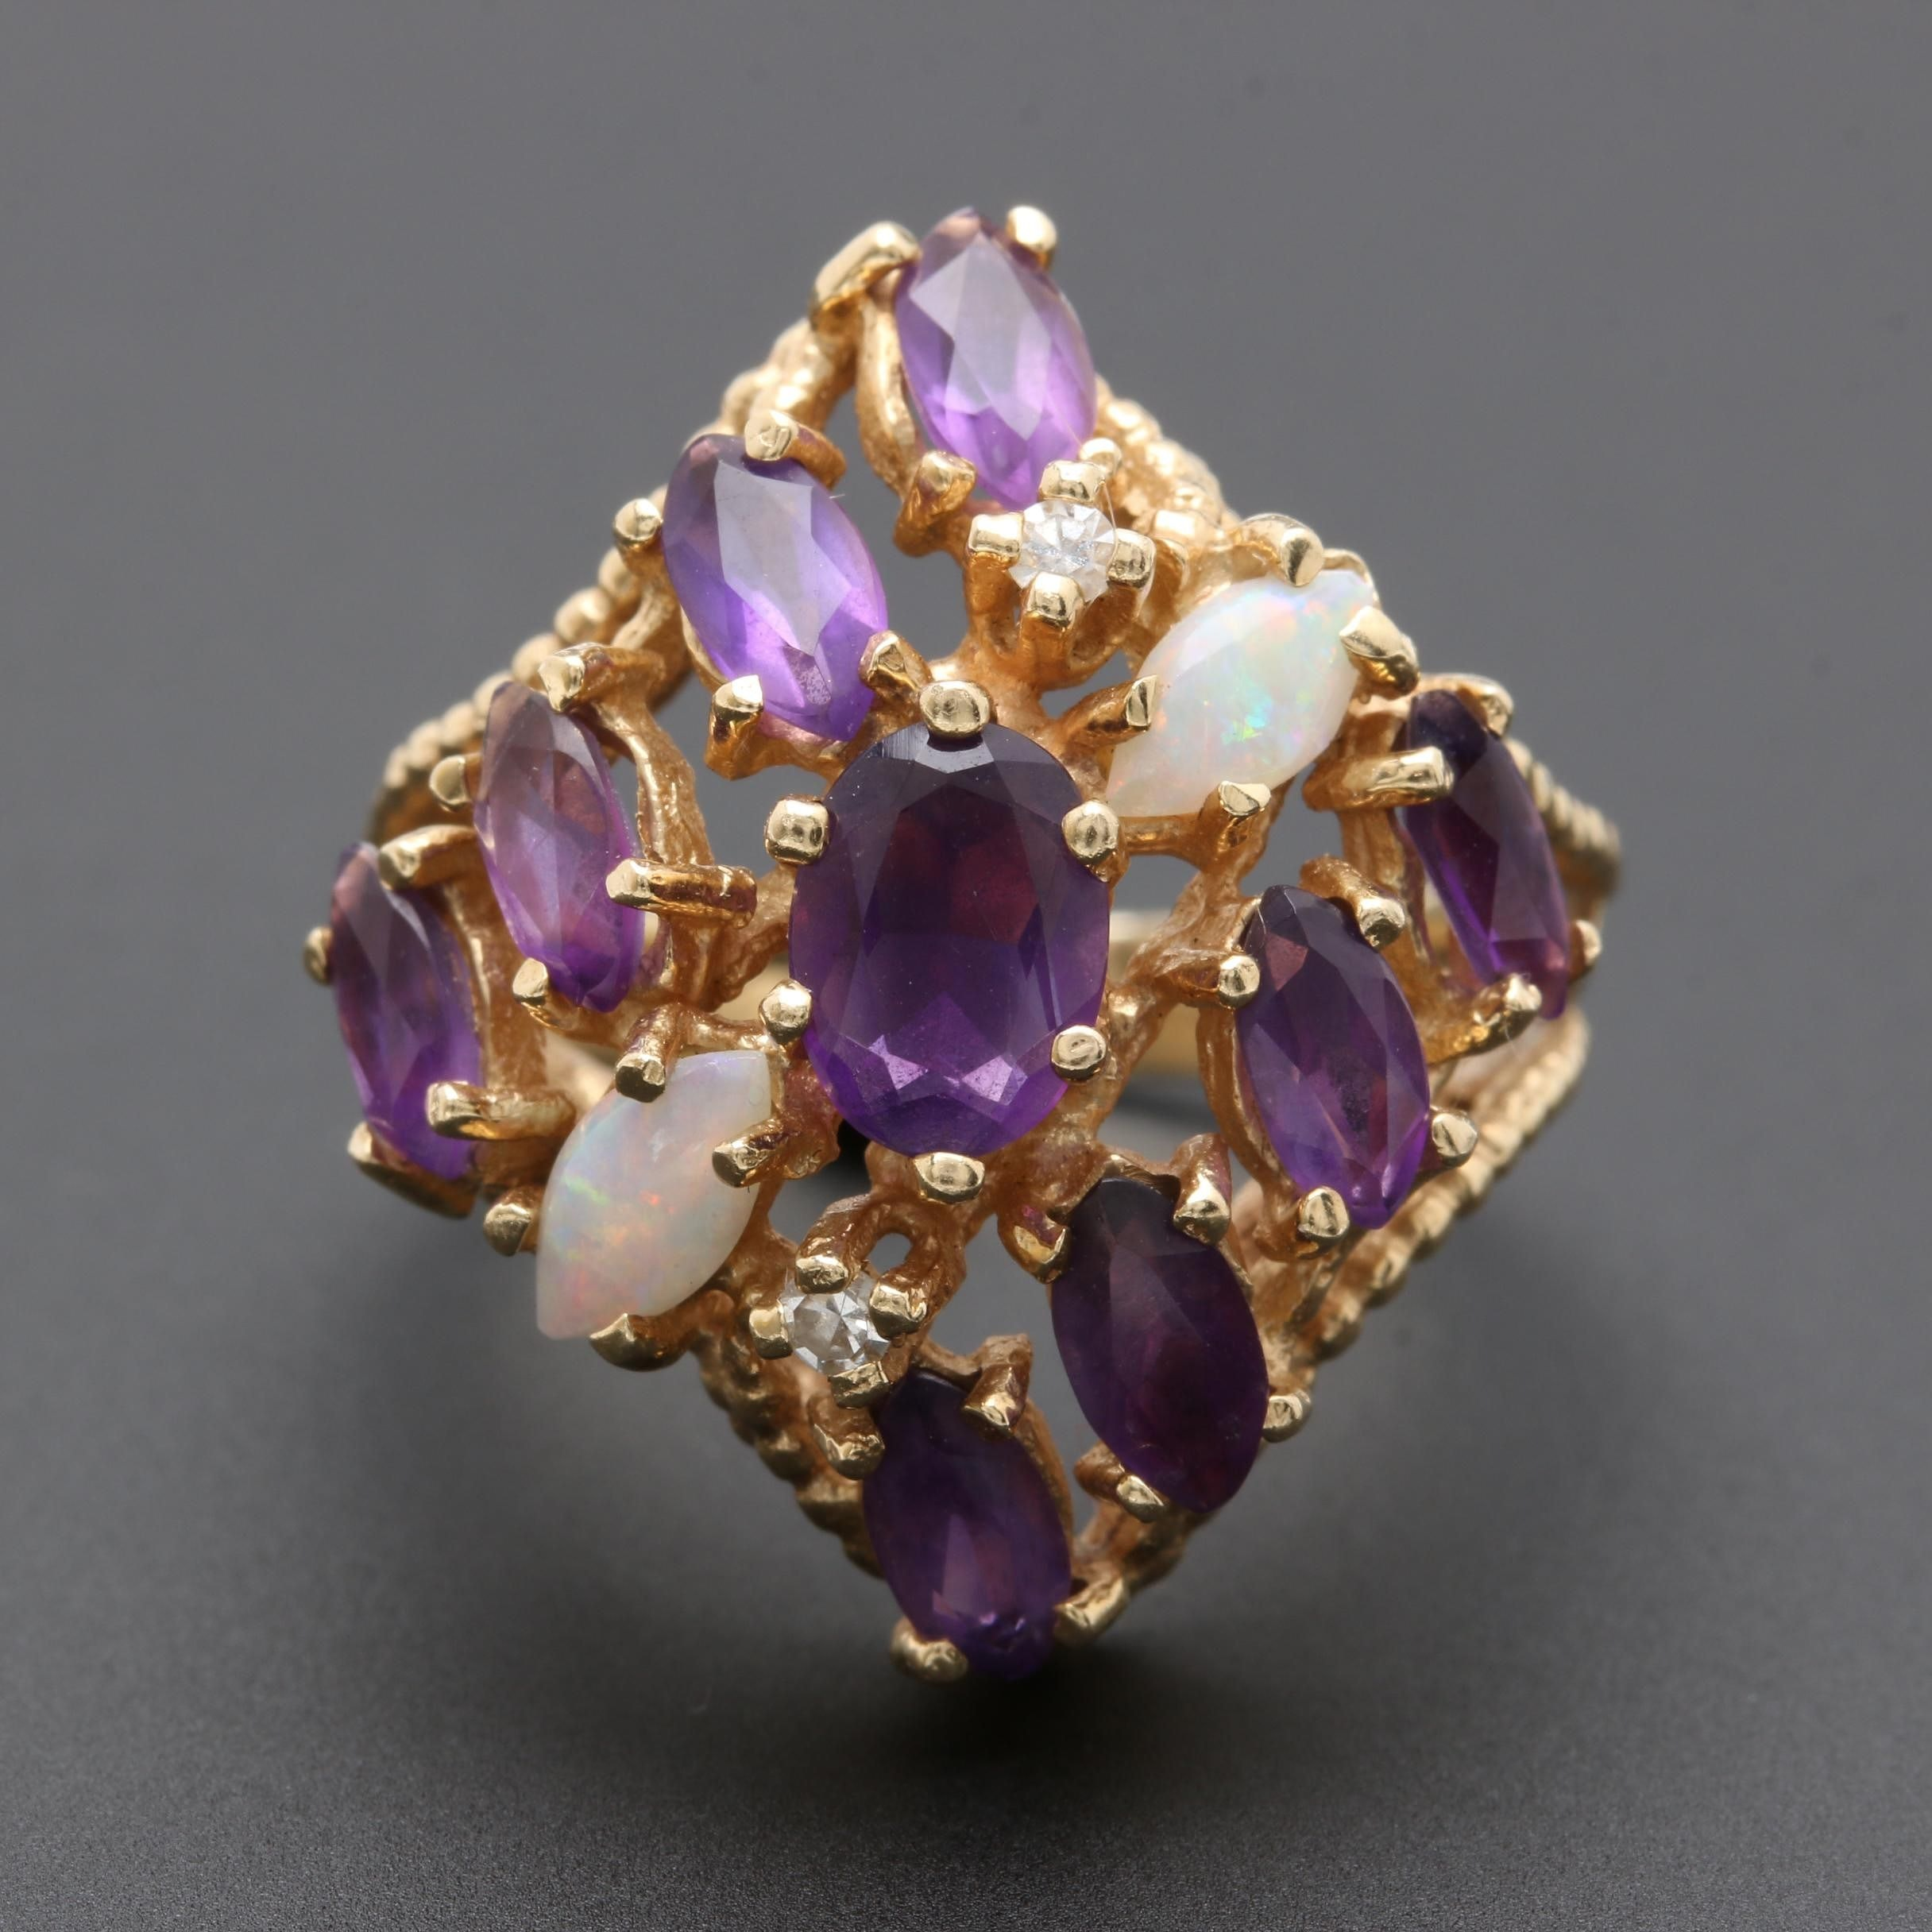 14K Yellow Gold Amethyst, Opal, and Diamond Ring